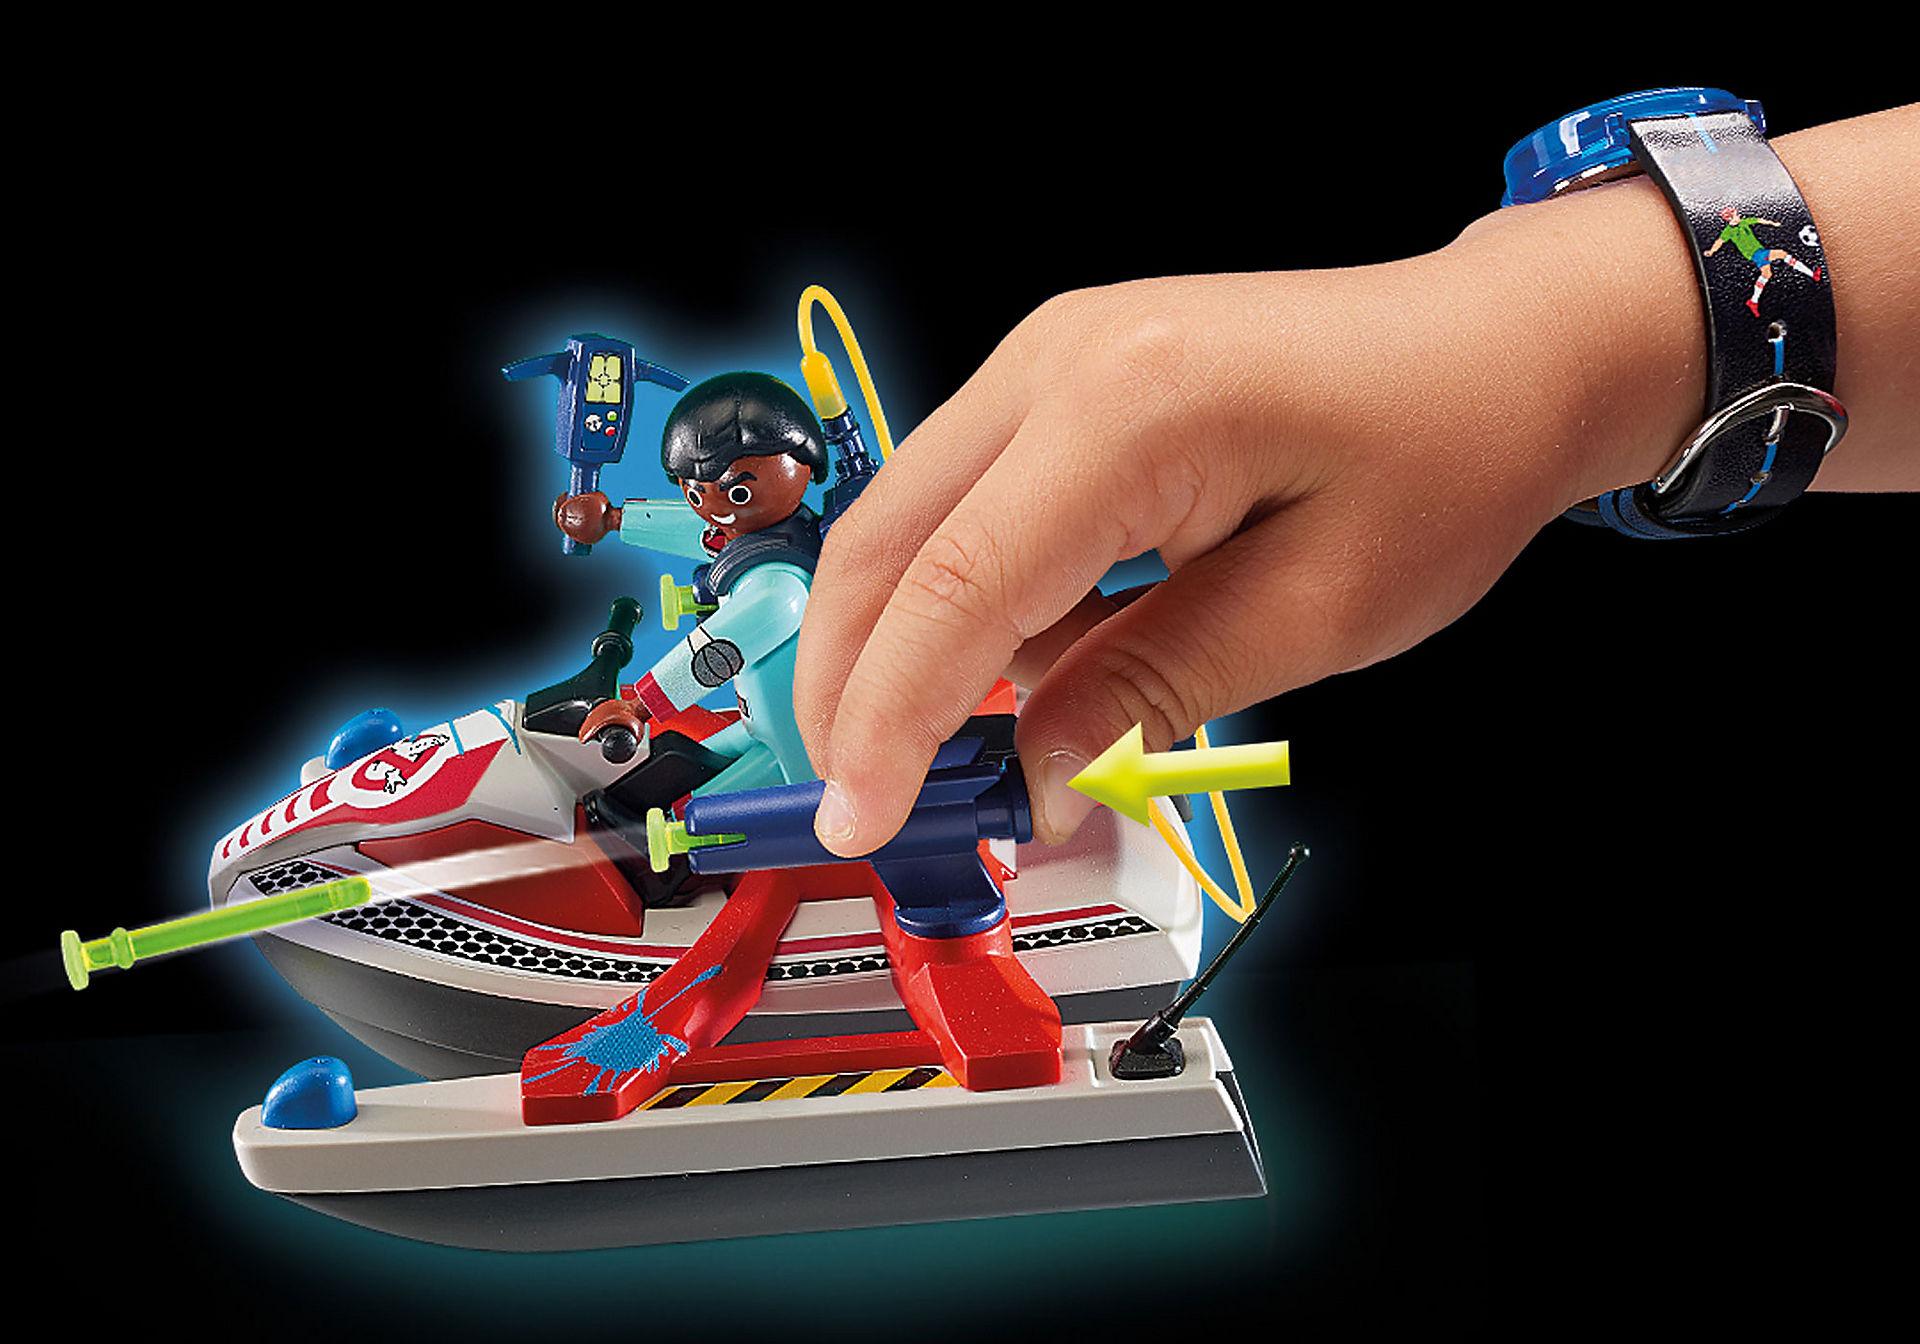 http://media.playmobil.com/i/playmobil/9387_product_extra1/Zeddemore with Aqua Scooter